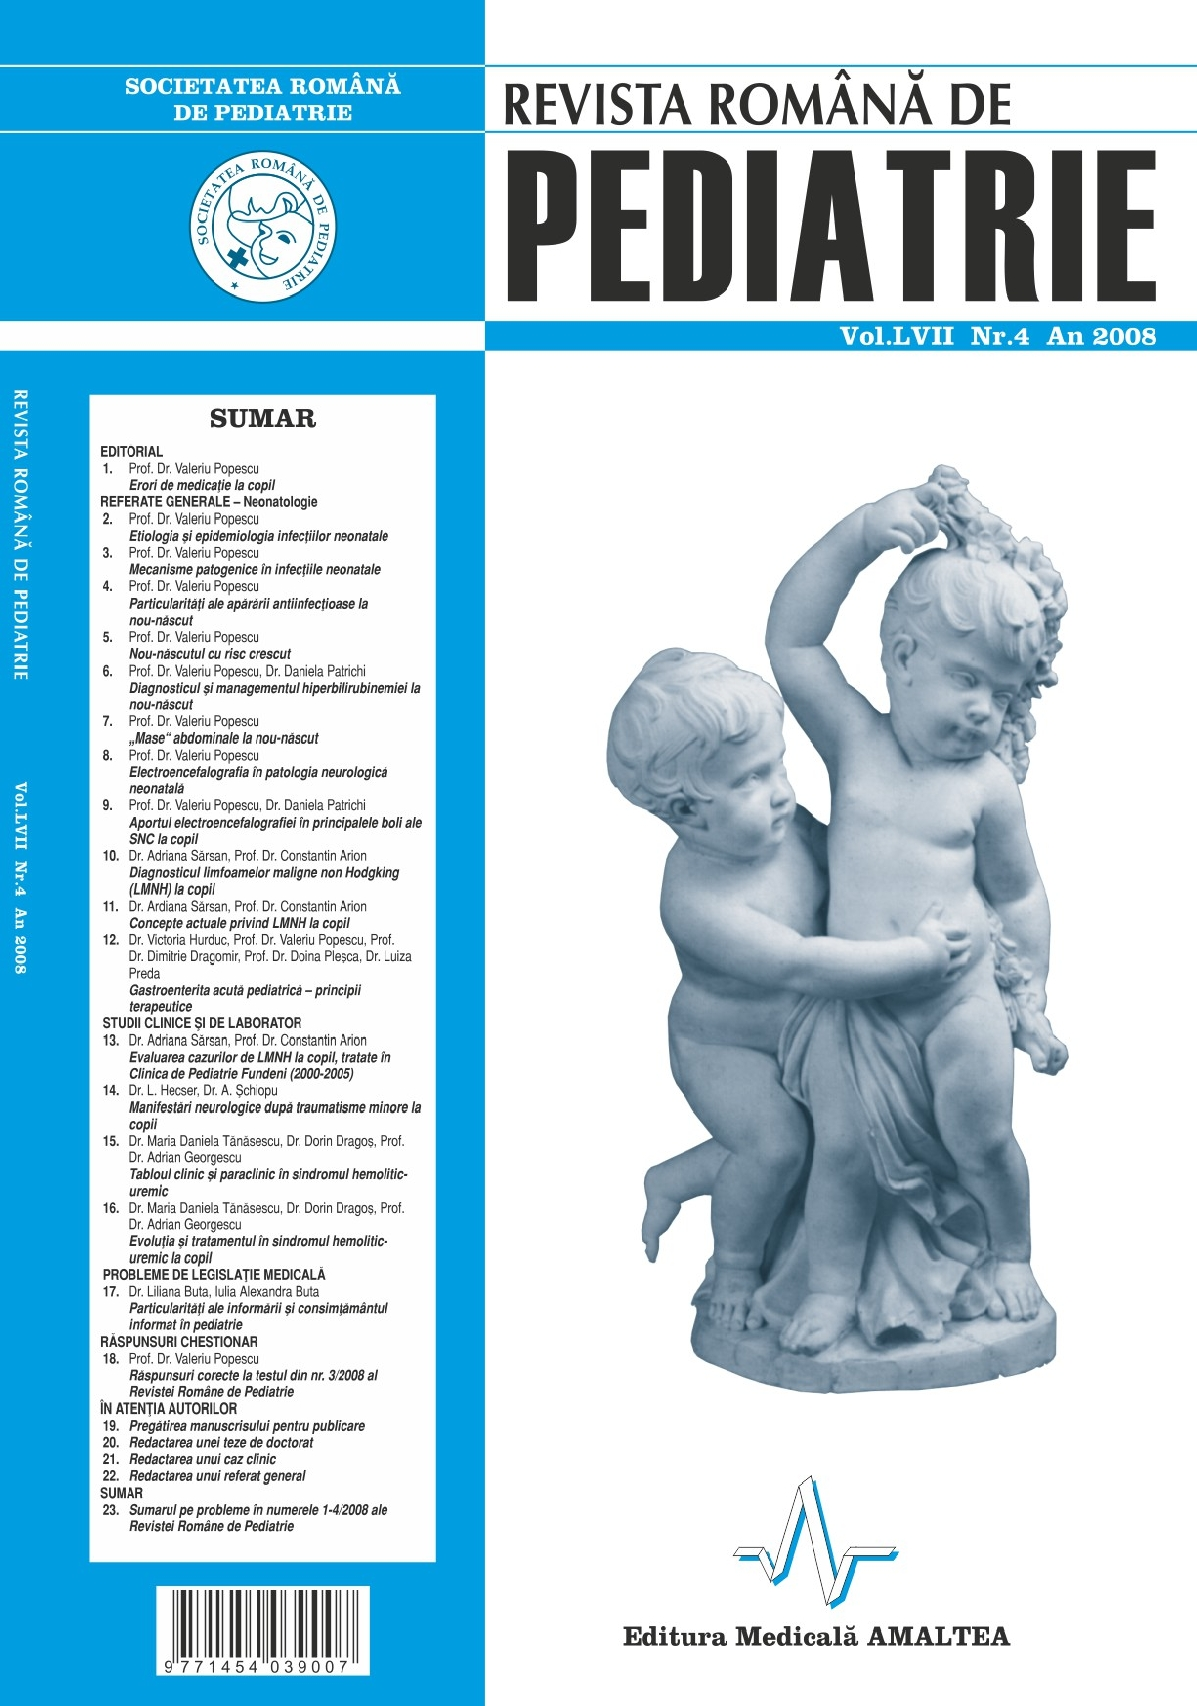 Revista Romana de PEDIATRIE | Volumul LVII, Nr. 4, An 2008